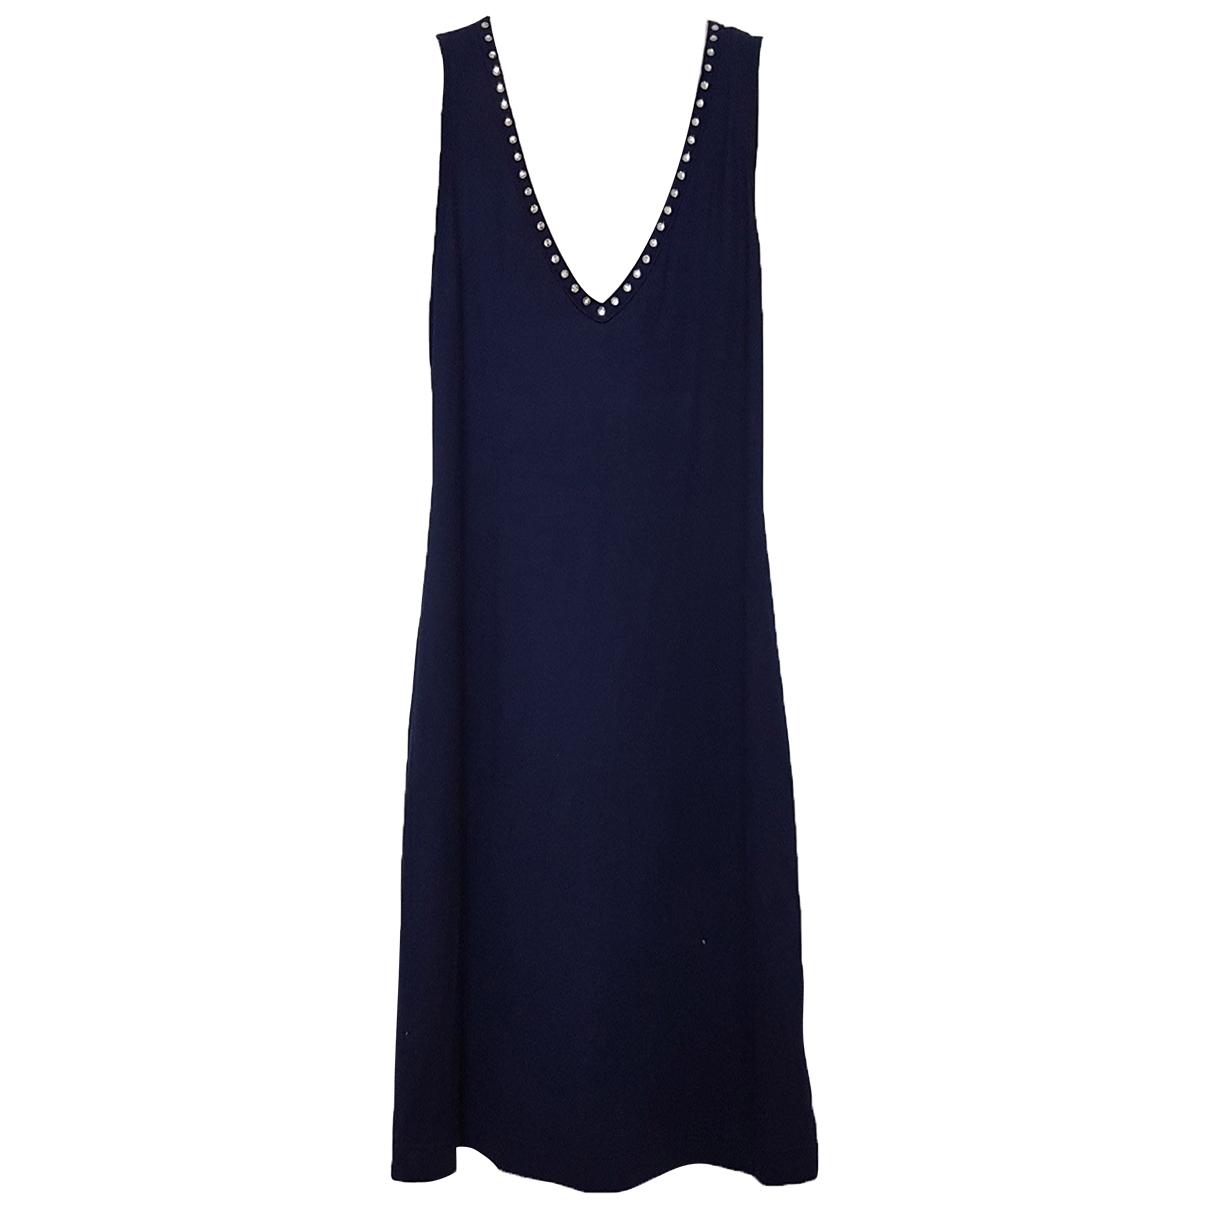 Dolce & Gabbana \N Kleid in  Blau Synthetik